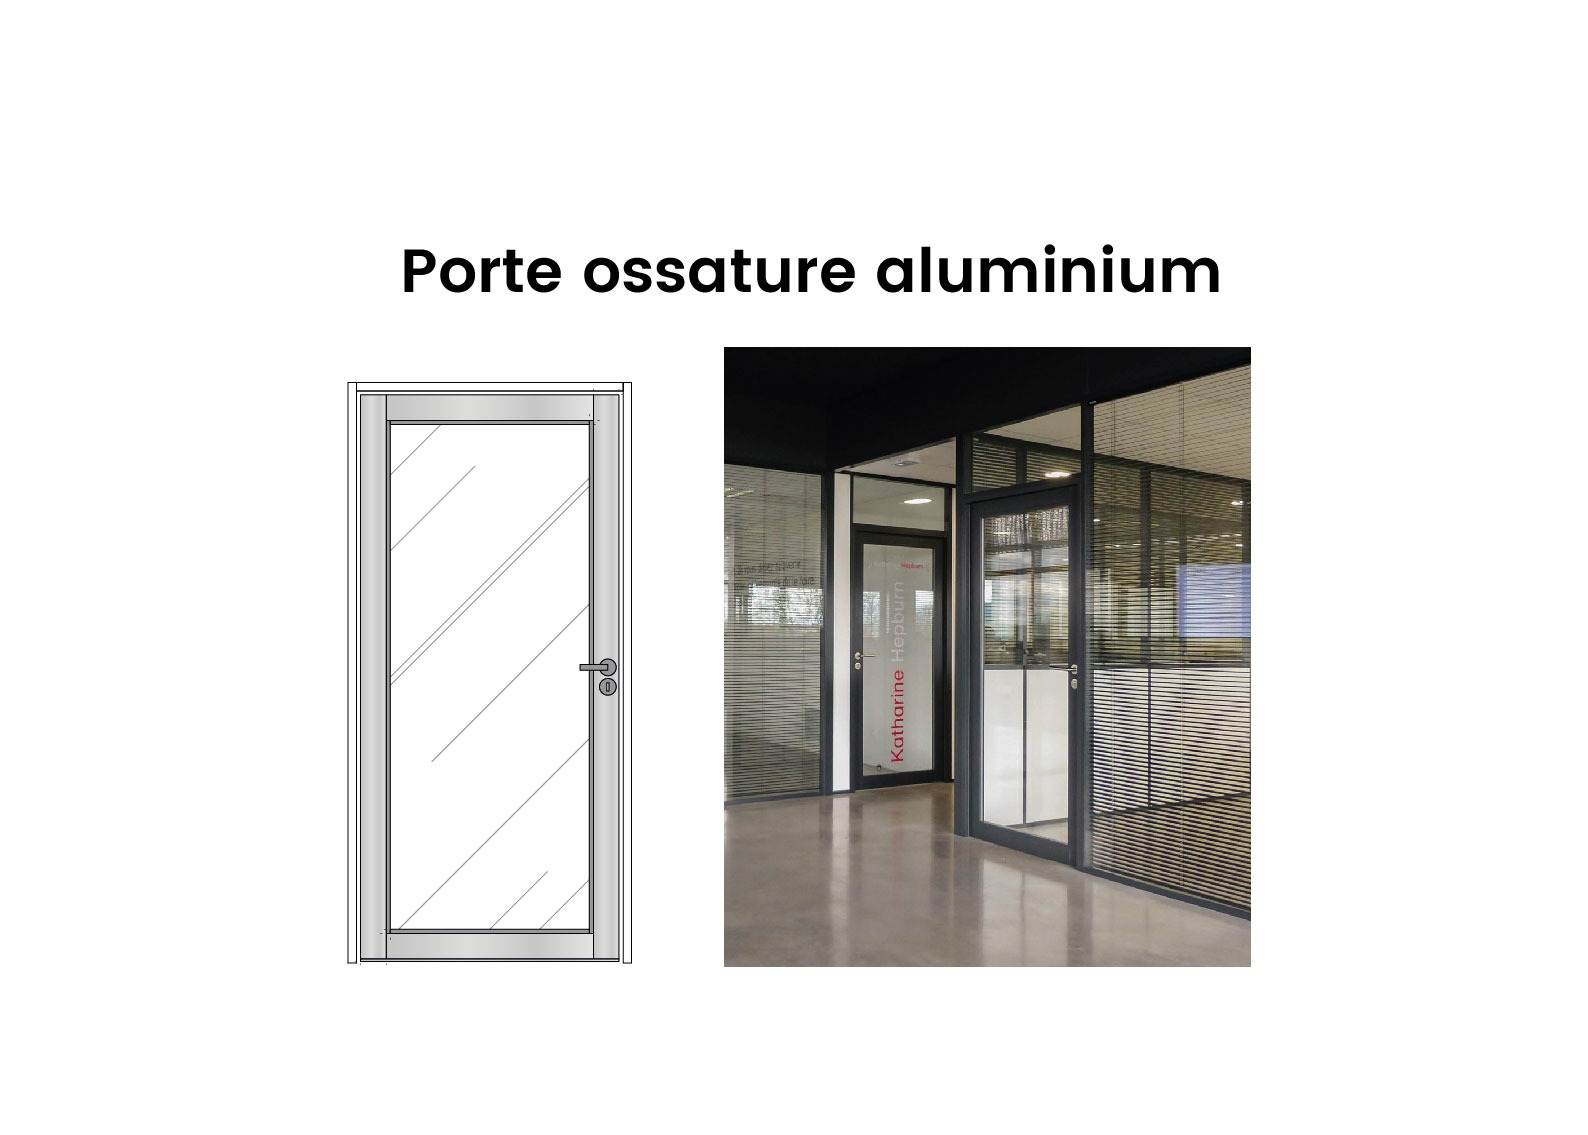 Porte Vitree Porte Ossature Aluminium Langlois Sobreti